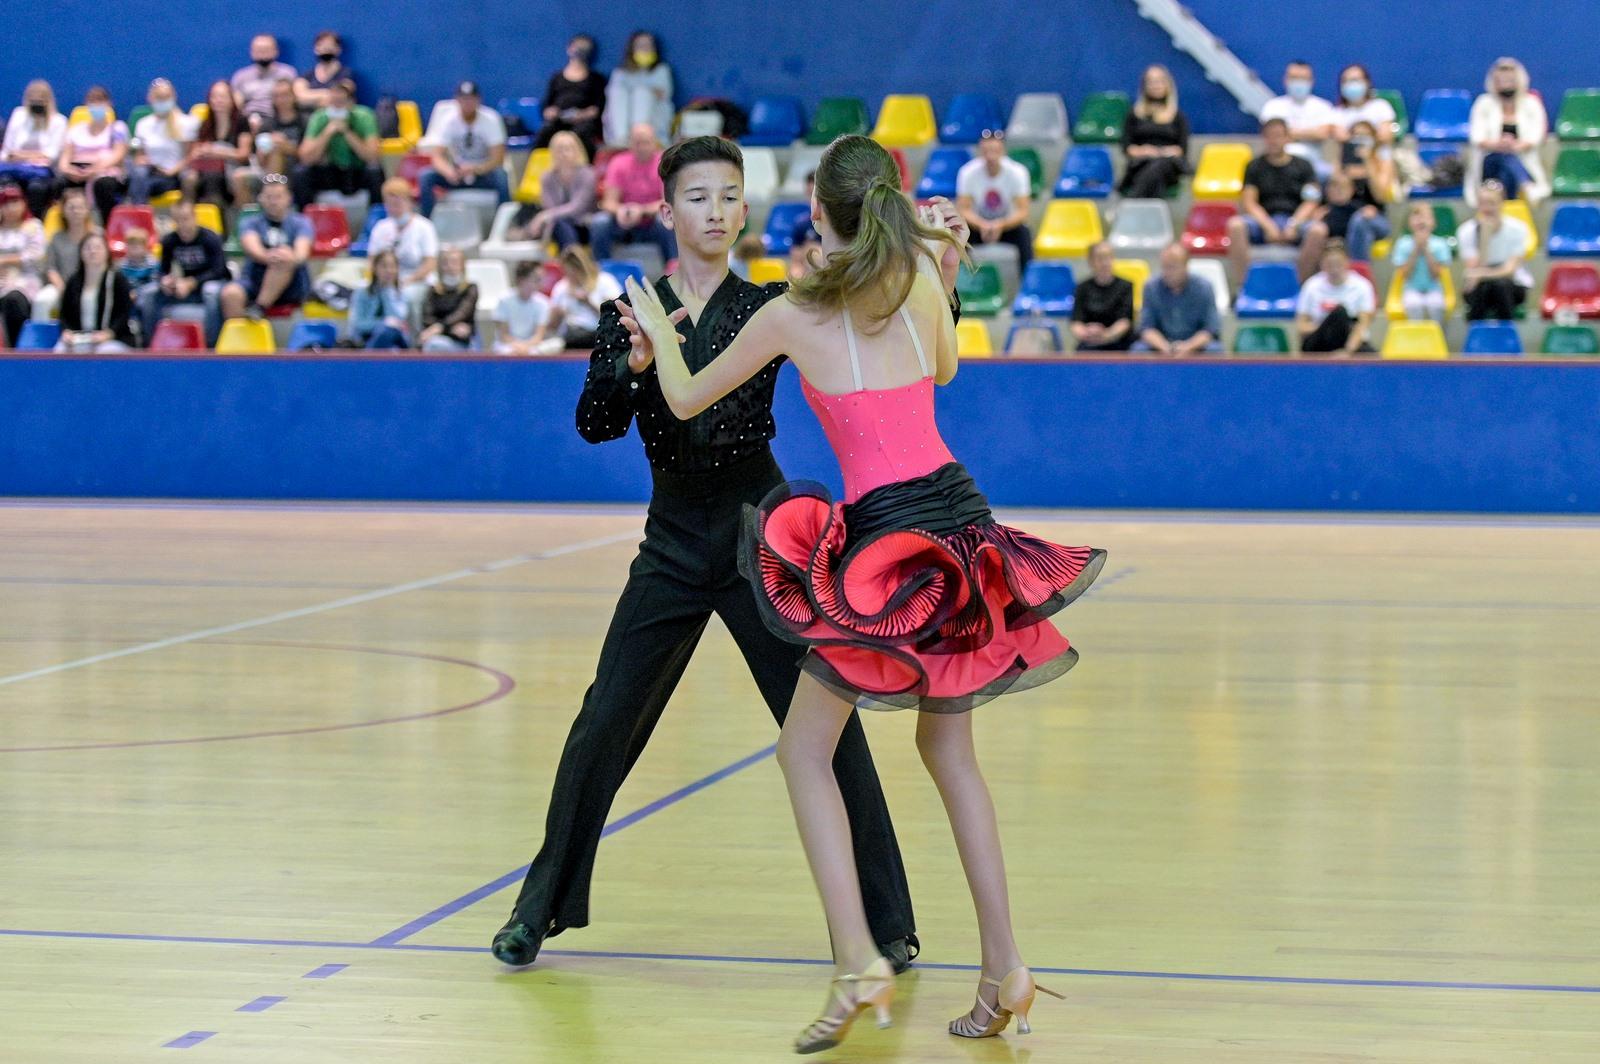 EU_tjedan_sporta_ples (7)